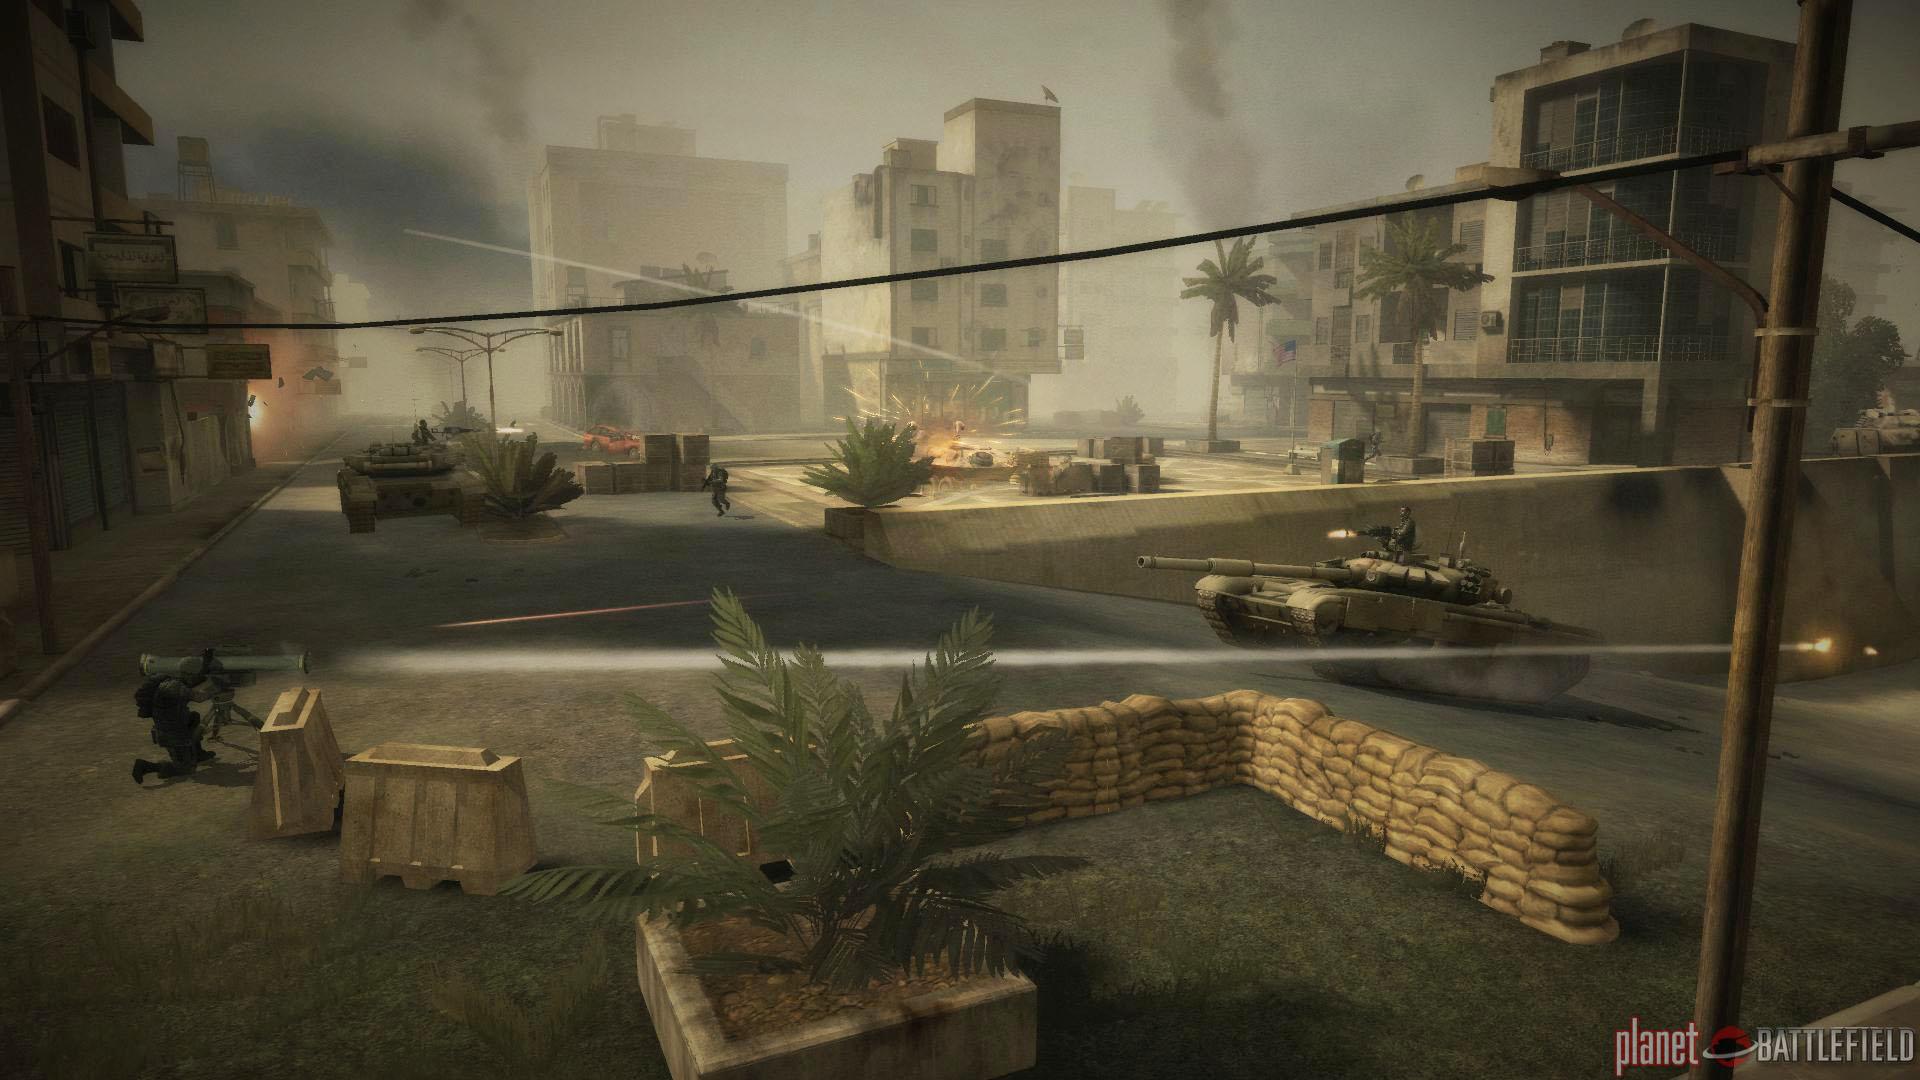 http://pnmedia.gamespy.com/planetbattlefield.gamespy.com/images/news3/Battlefield-Play4Free_007.jpg